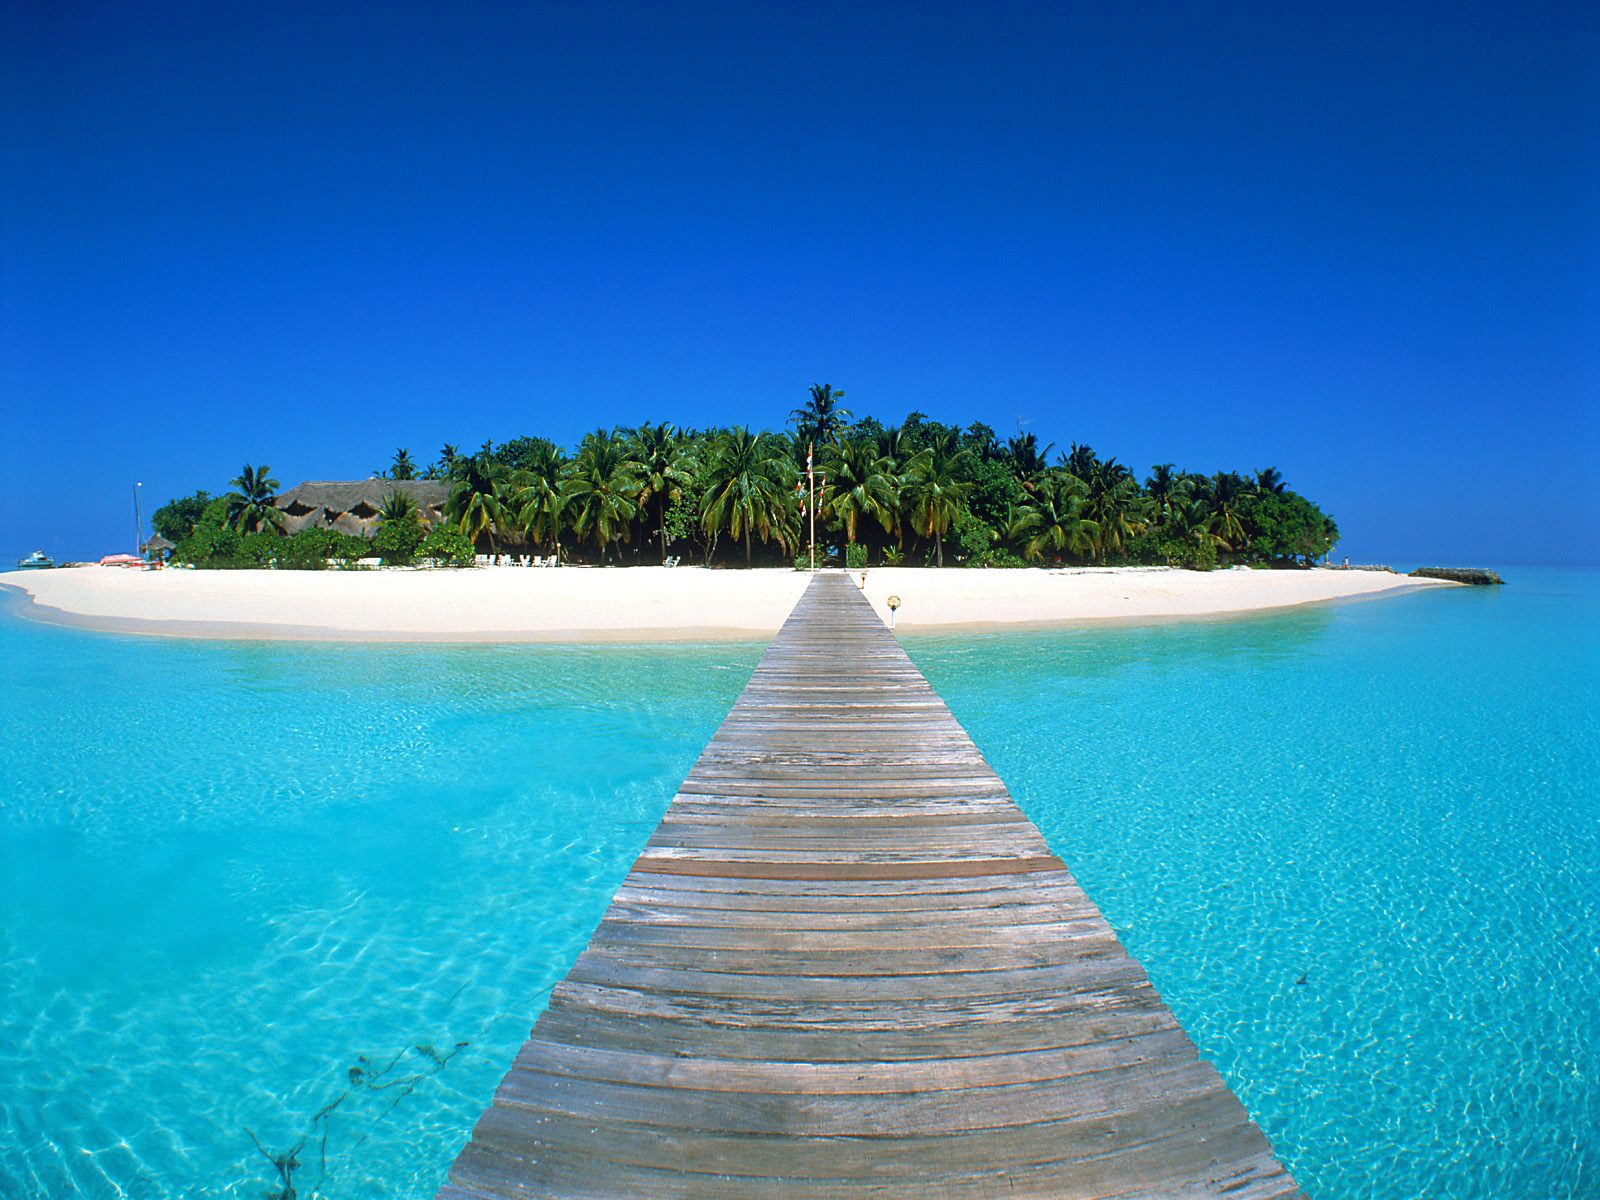 World Visits: Maldives Island Great Visit Place